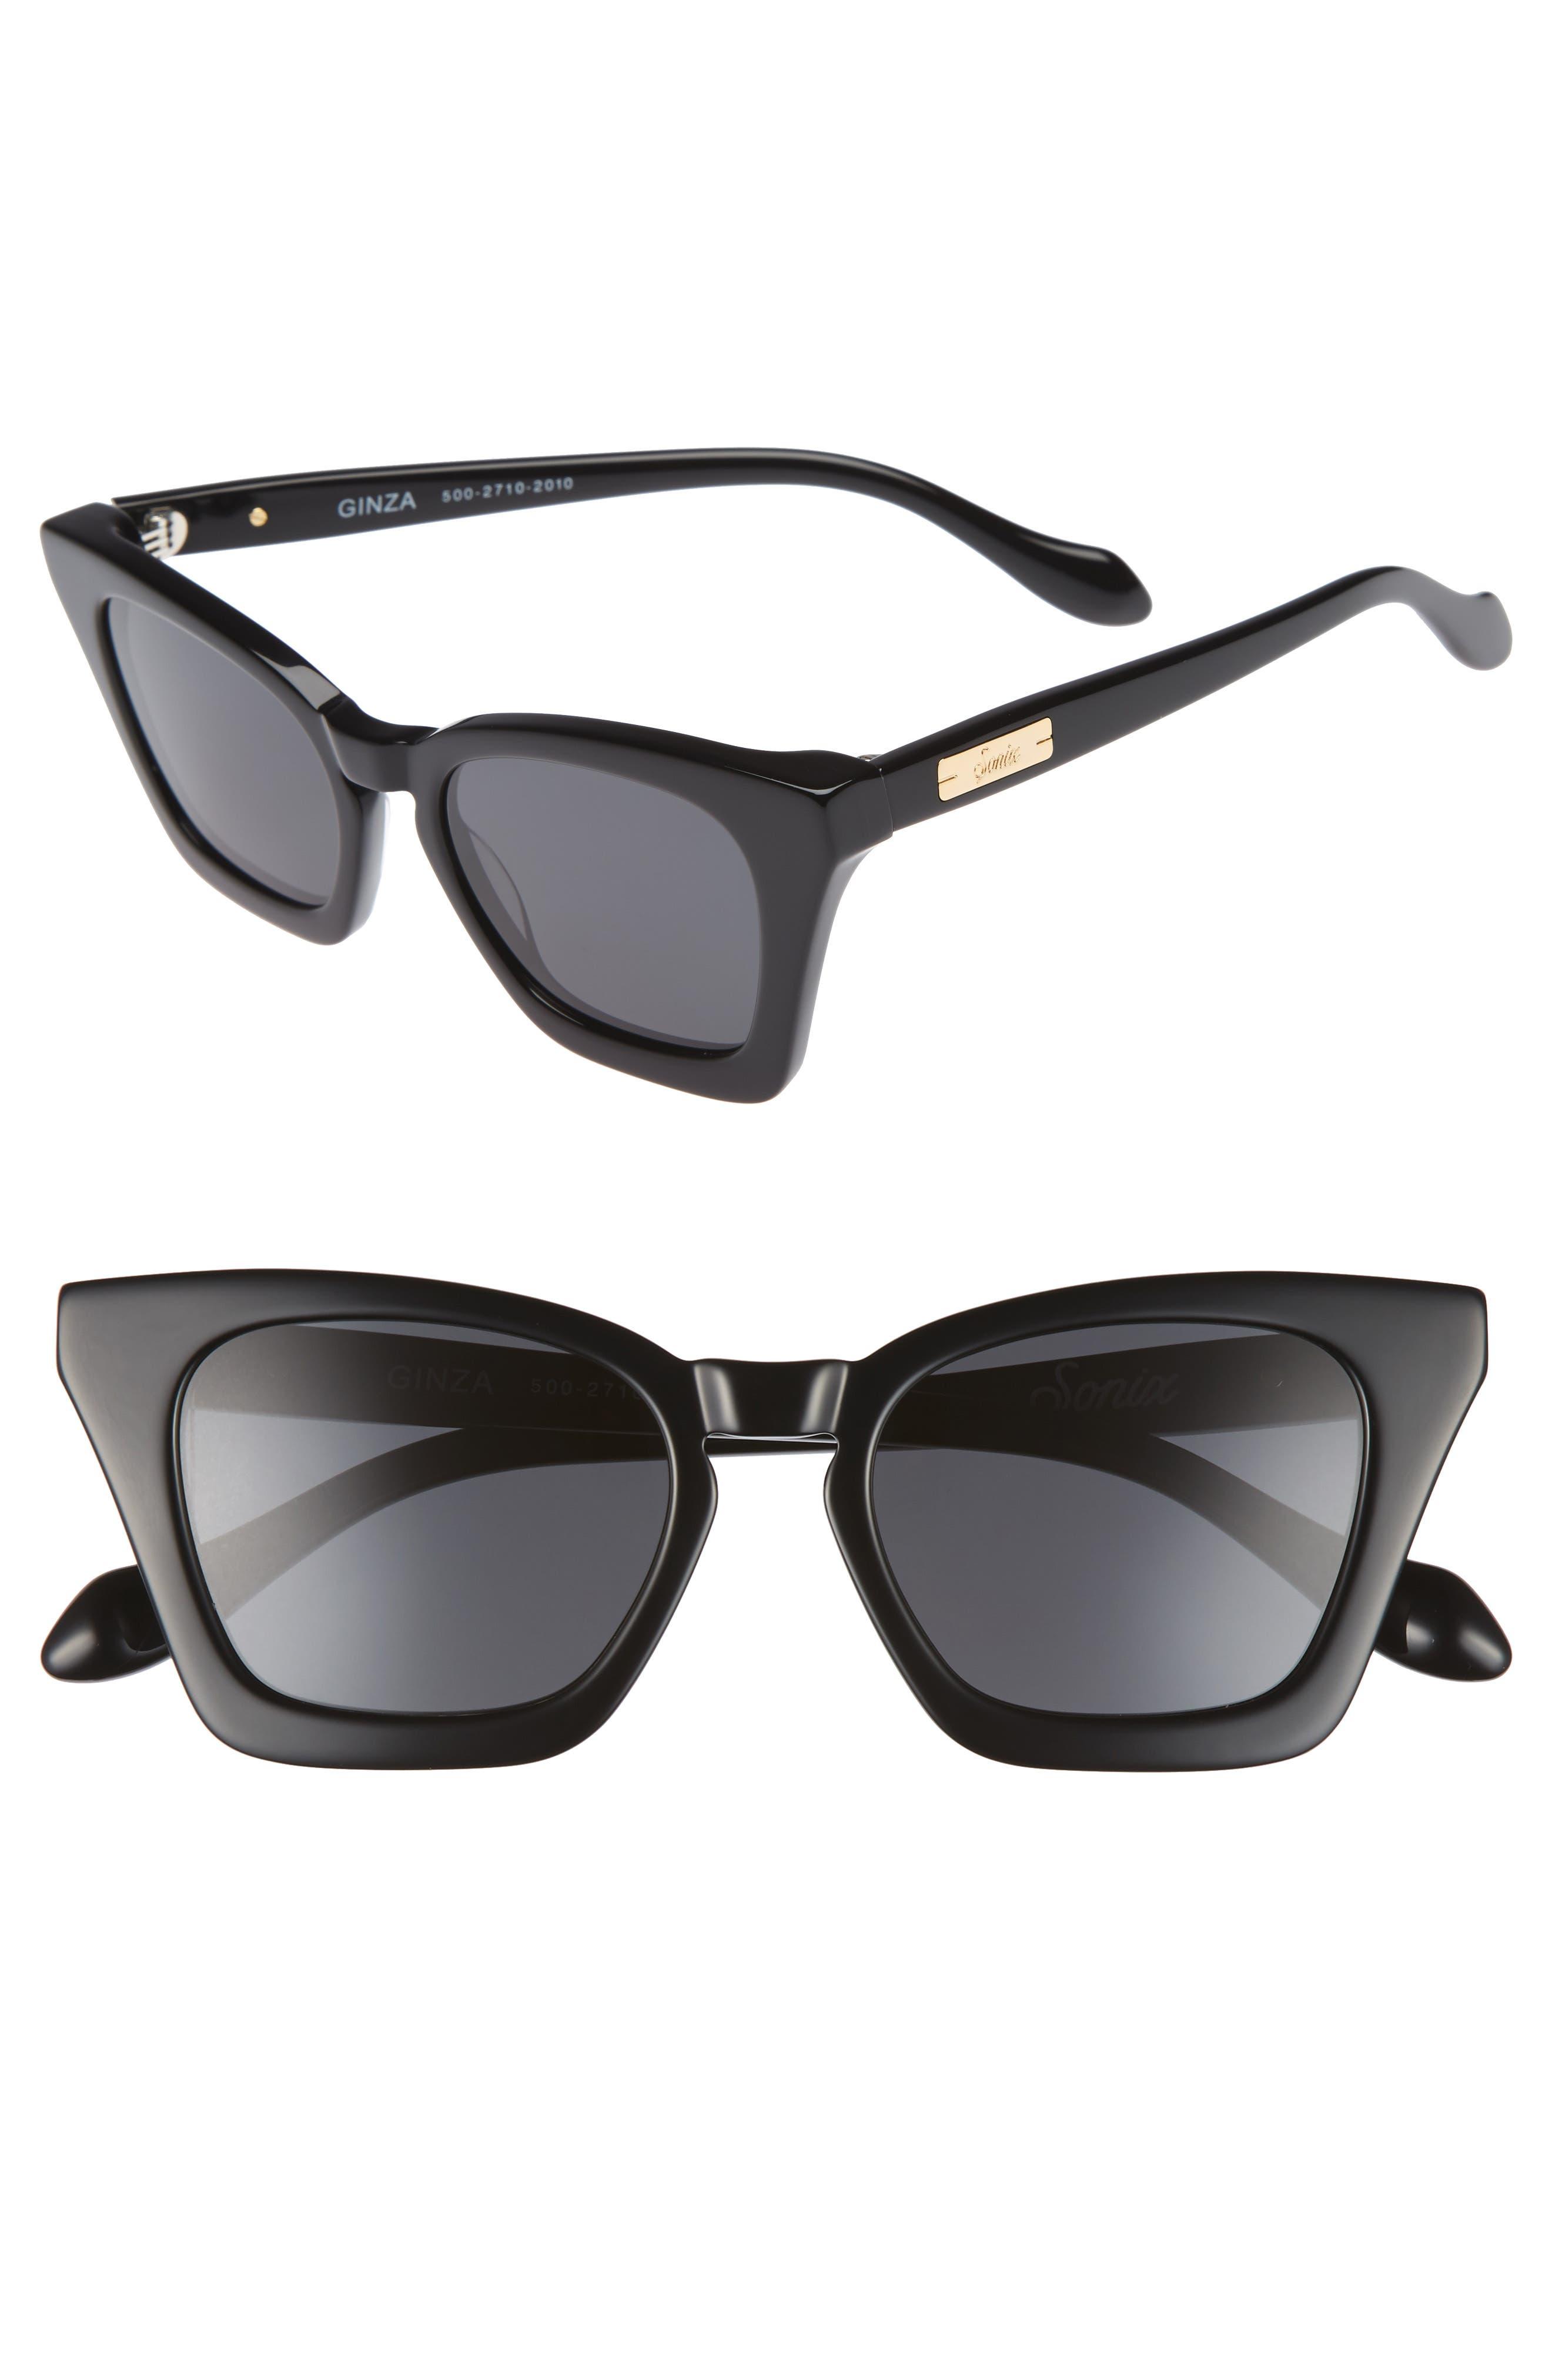 Sonix Ginza 50mm Cat Eye Sunglasses